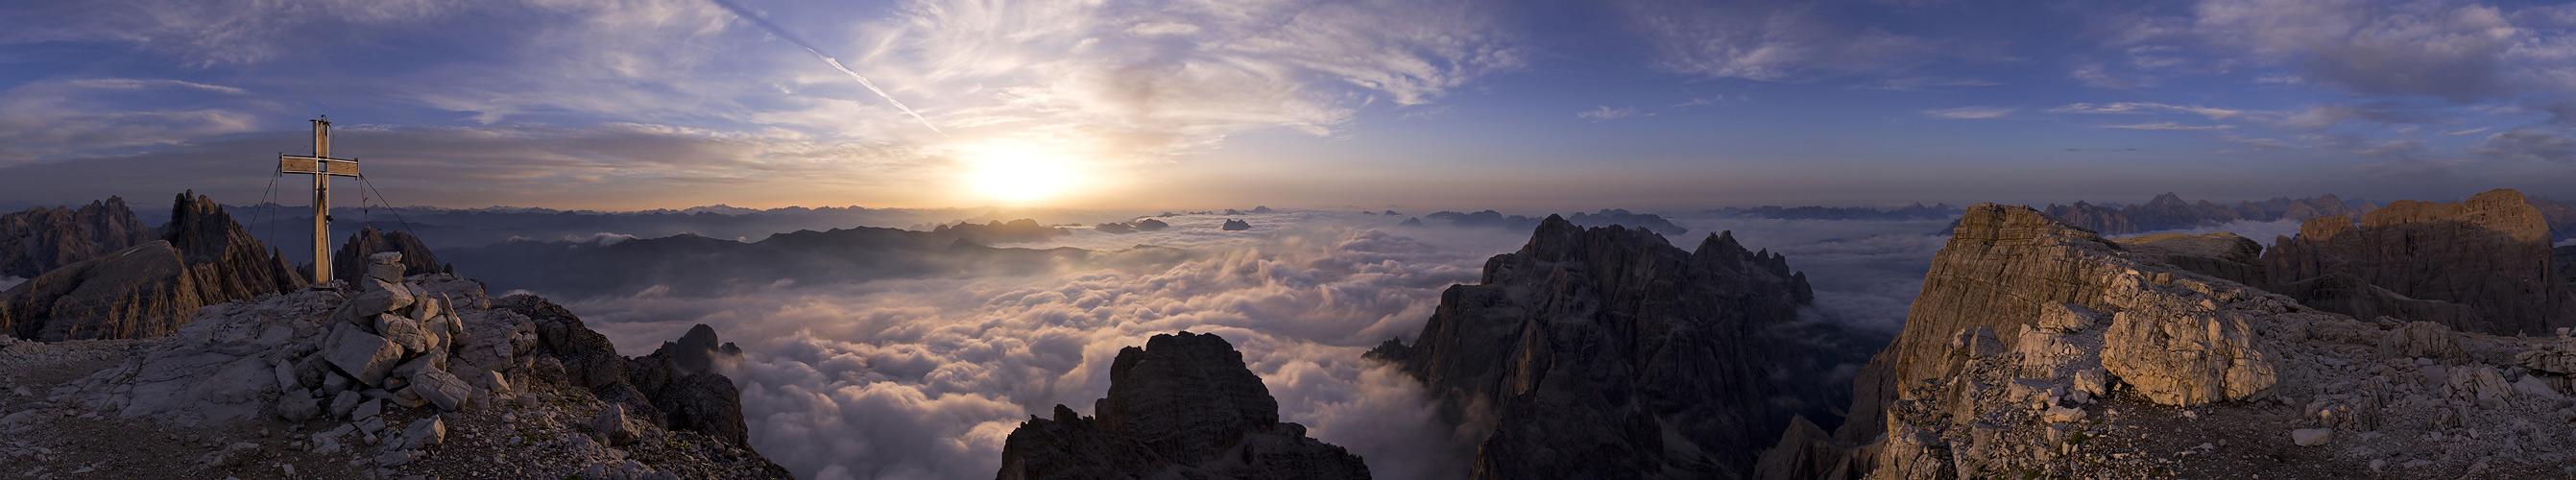 Dolomiten-Morgen